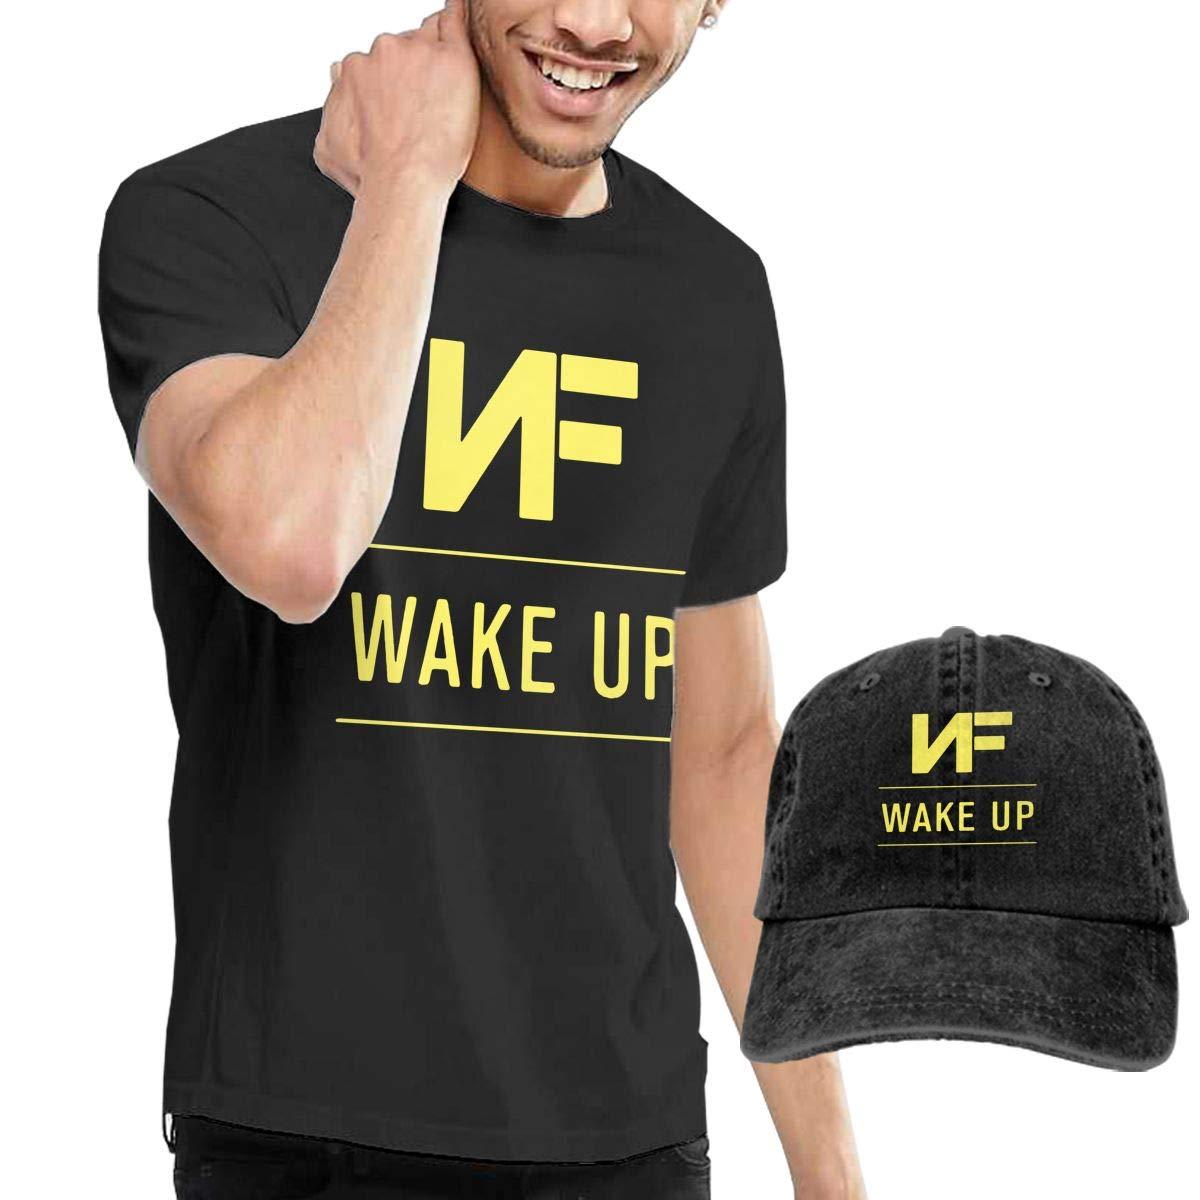 WWTBBJ-B NF Wake Up Adult Mens Summer T-Shirt and Sport Jean Headgear